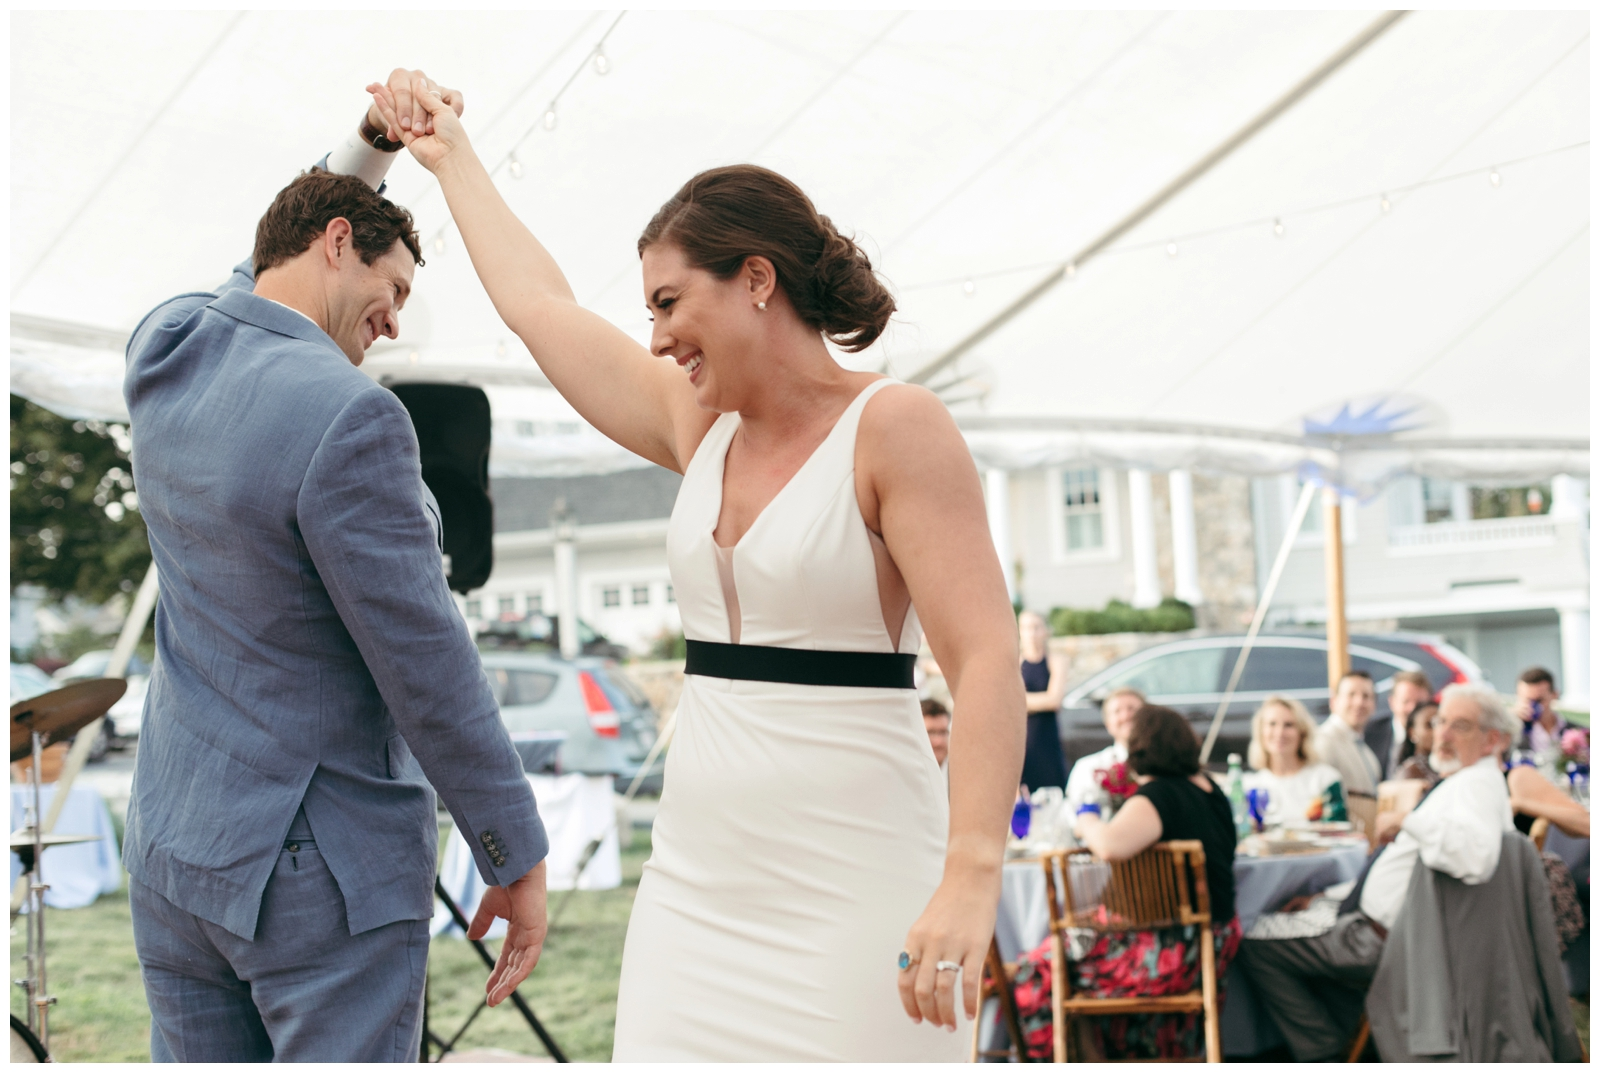 Bailey-Q-Photo-Backyard-Wedding-South-Shore-Boston-Wedding-Photographer-094.jpg